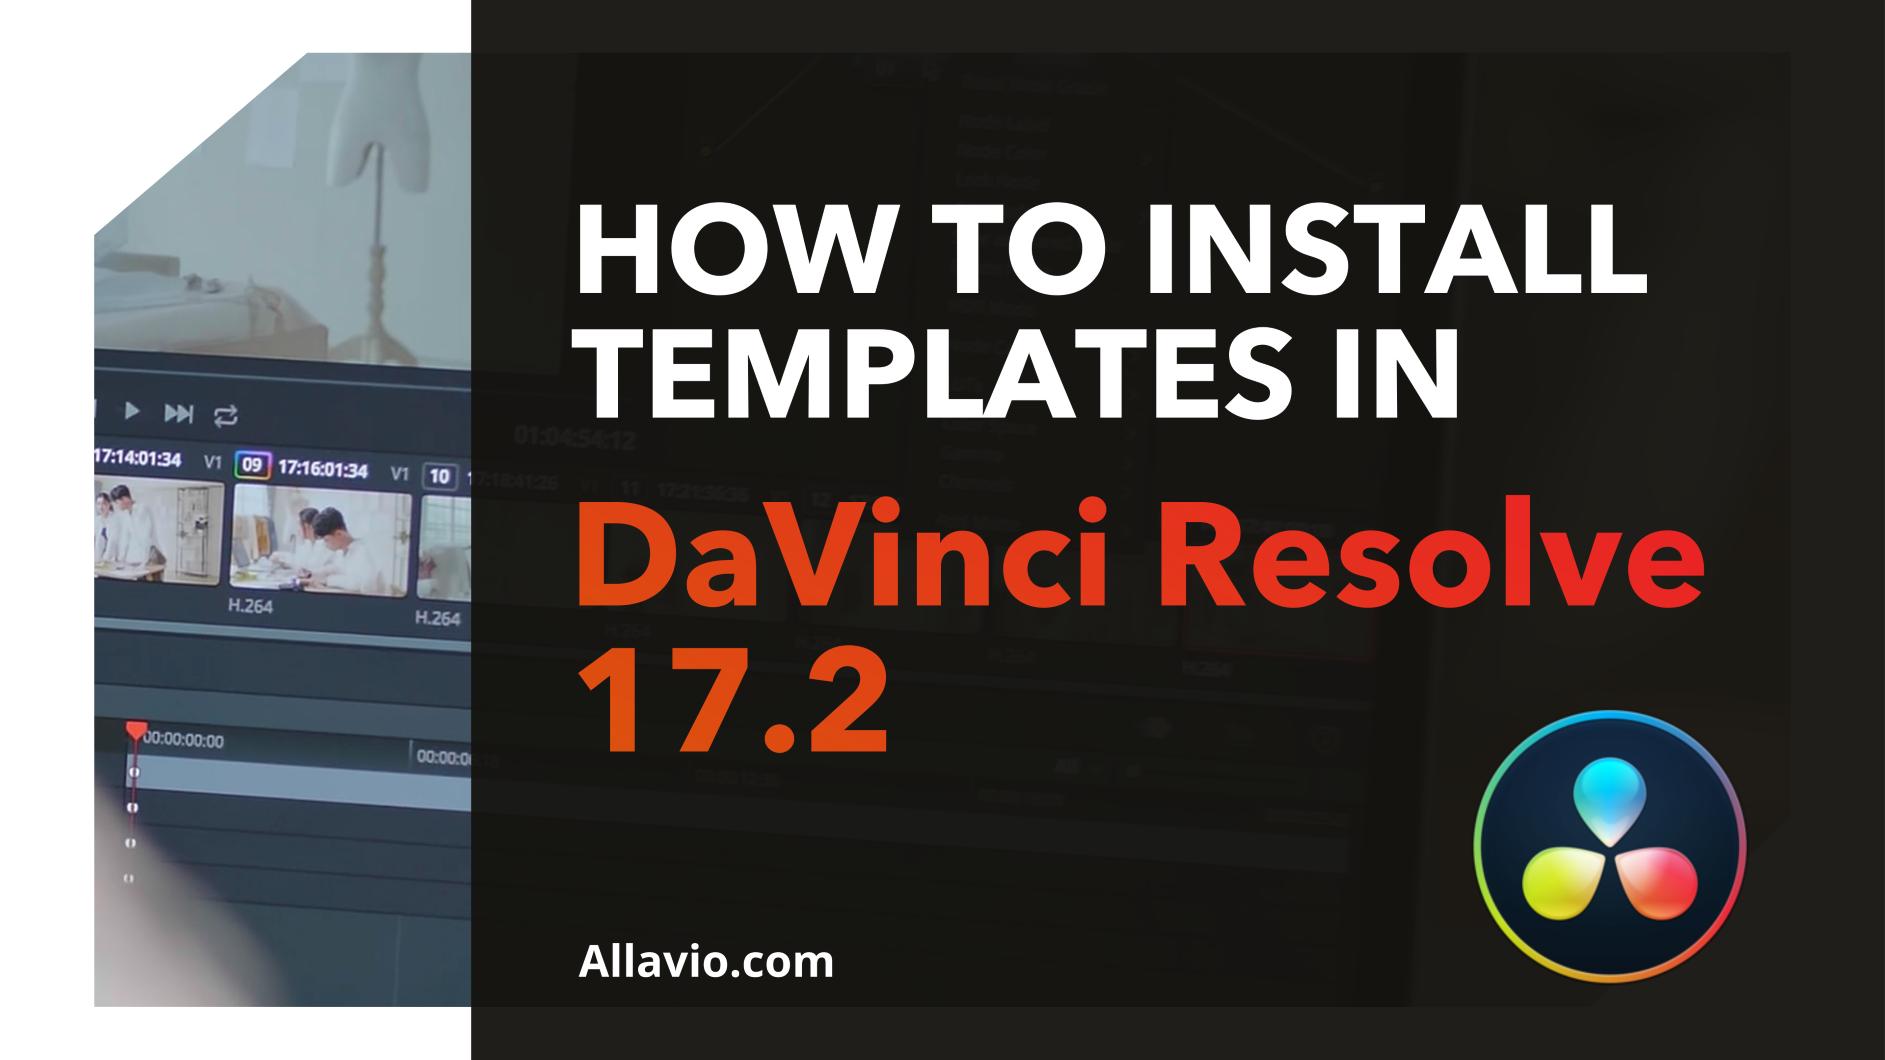 how to install templates inside Davinci Resolve 17.2